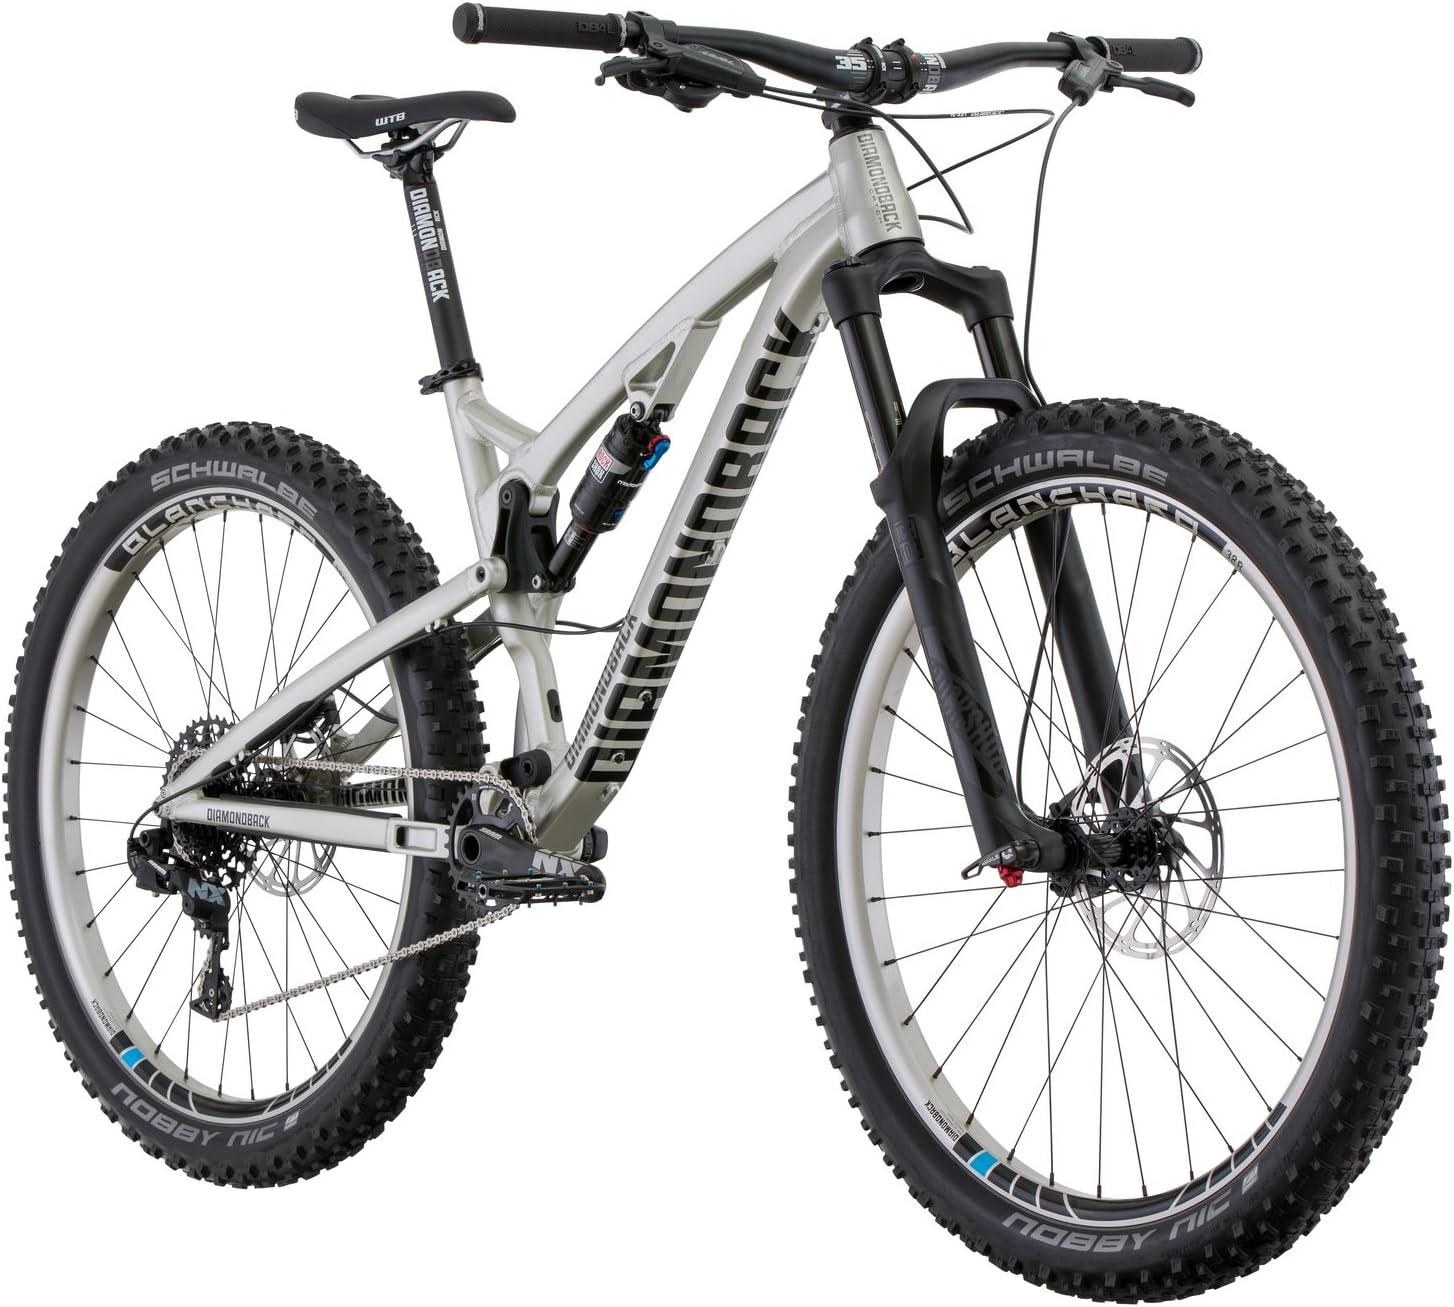 Diamondback Bicycles Catch 1 Best full suspension mountain bike under 2000